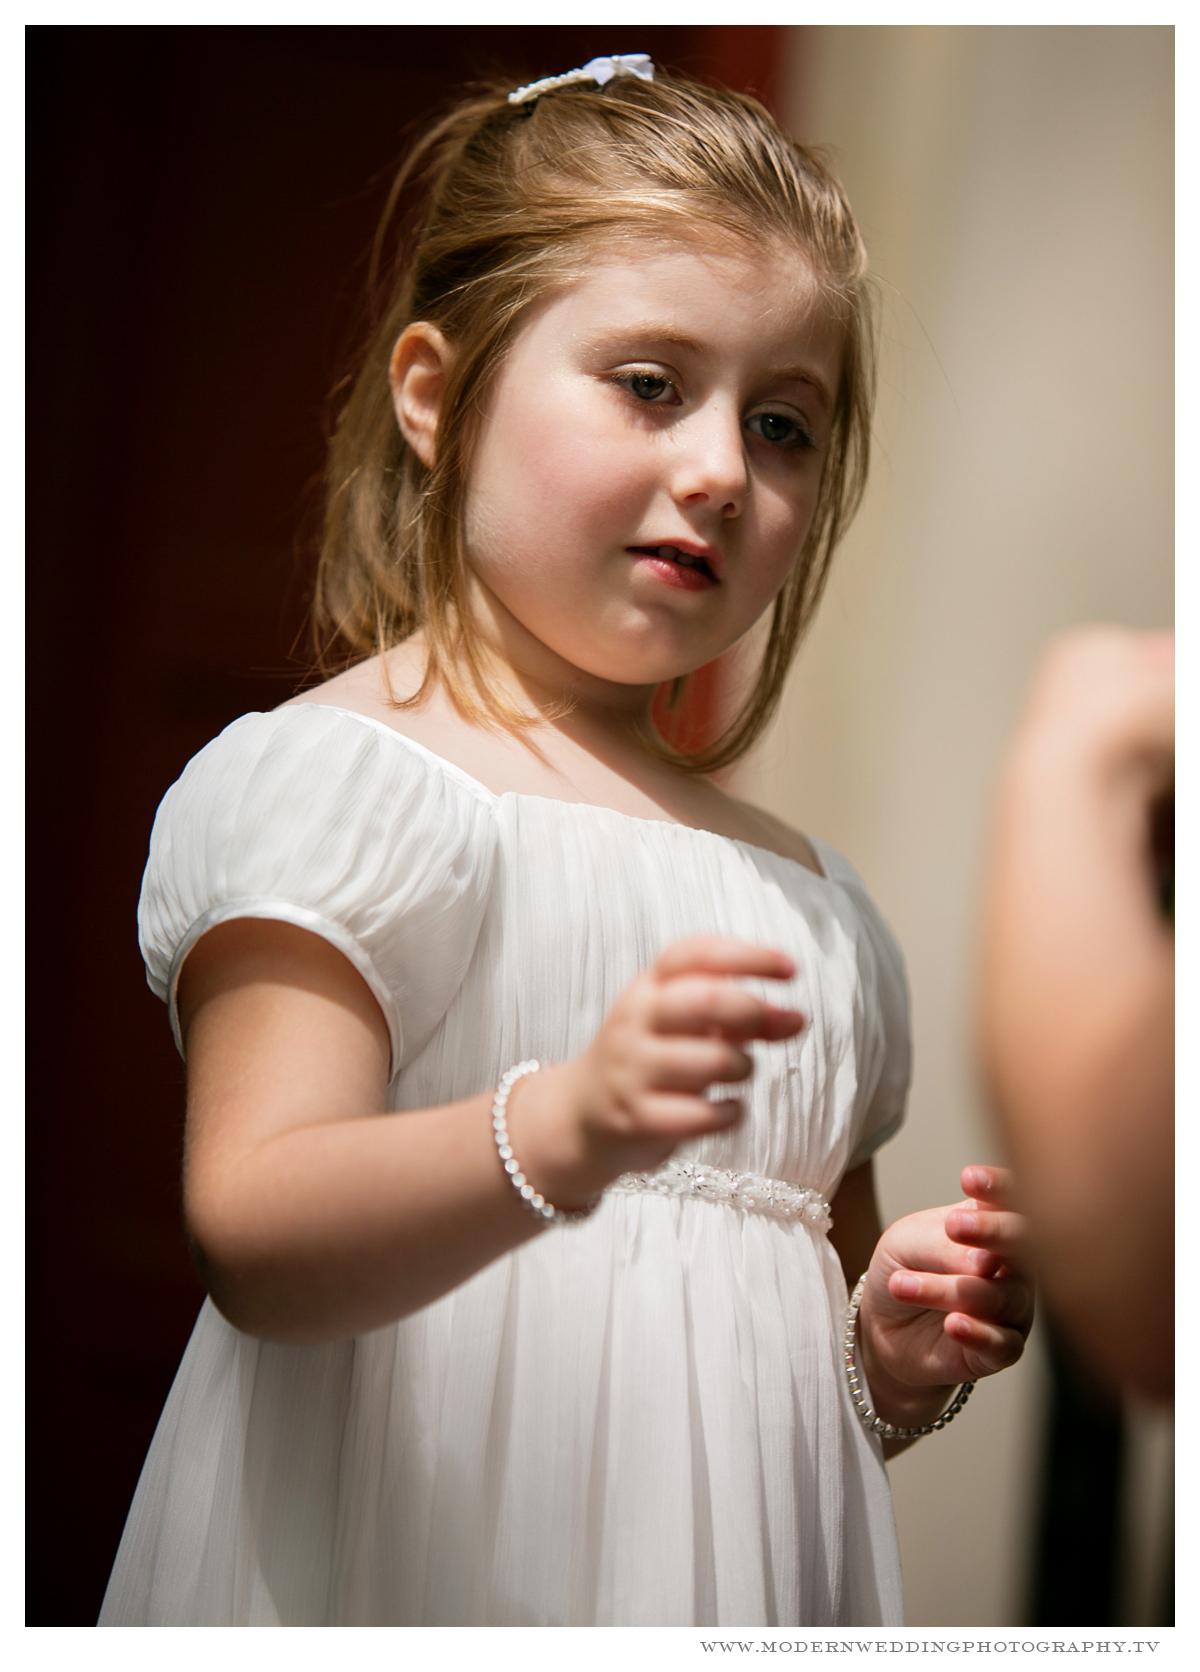 Modern Wedding Photography 0277 .jpg